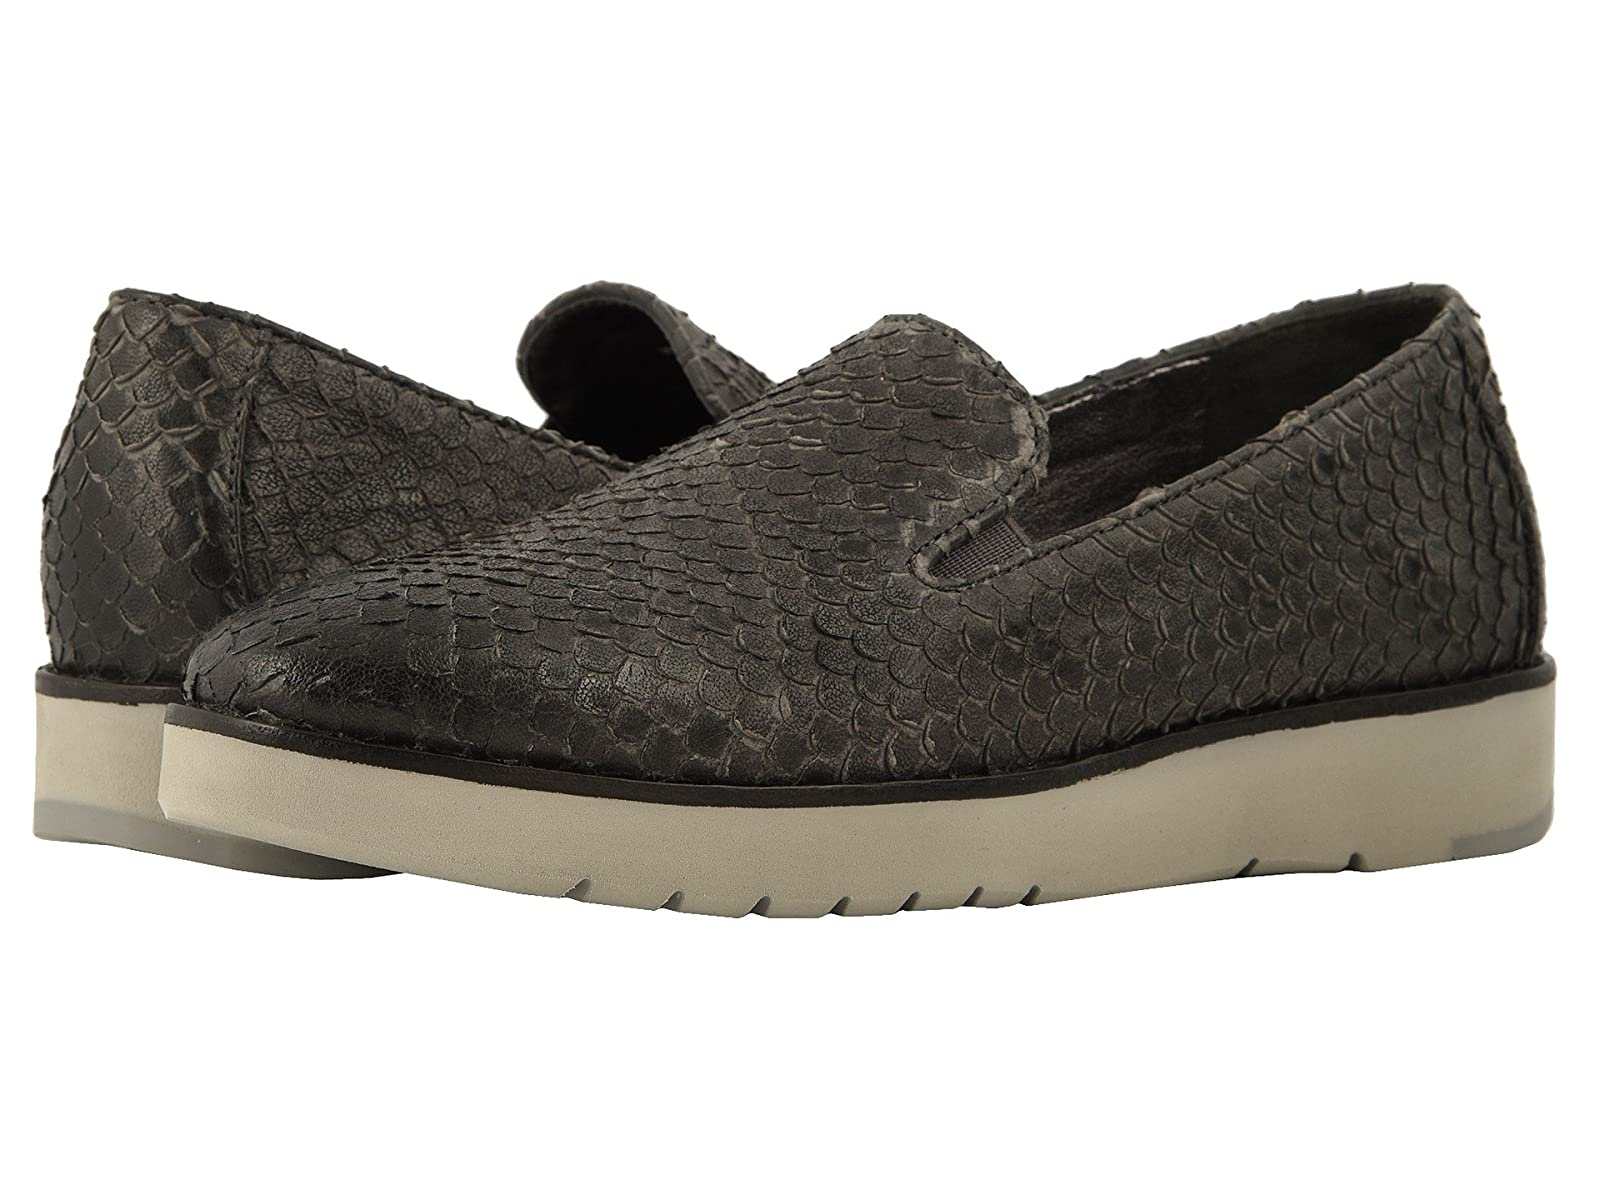 Johnston & Murphy PenelopeAtmospheric grades have affordable shoes